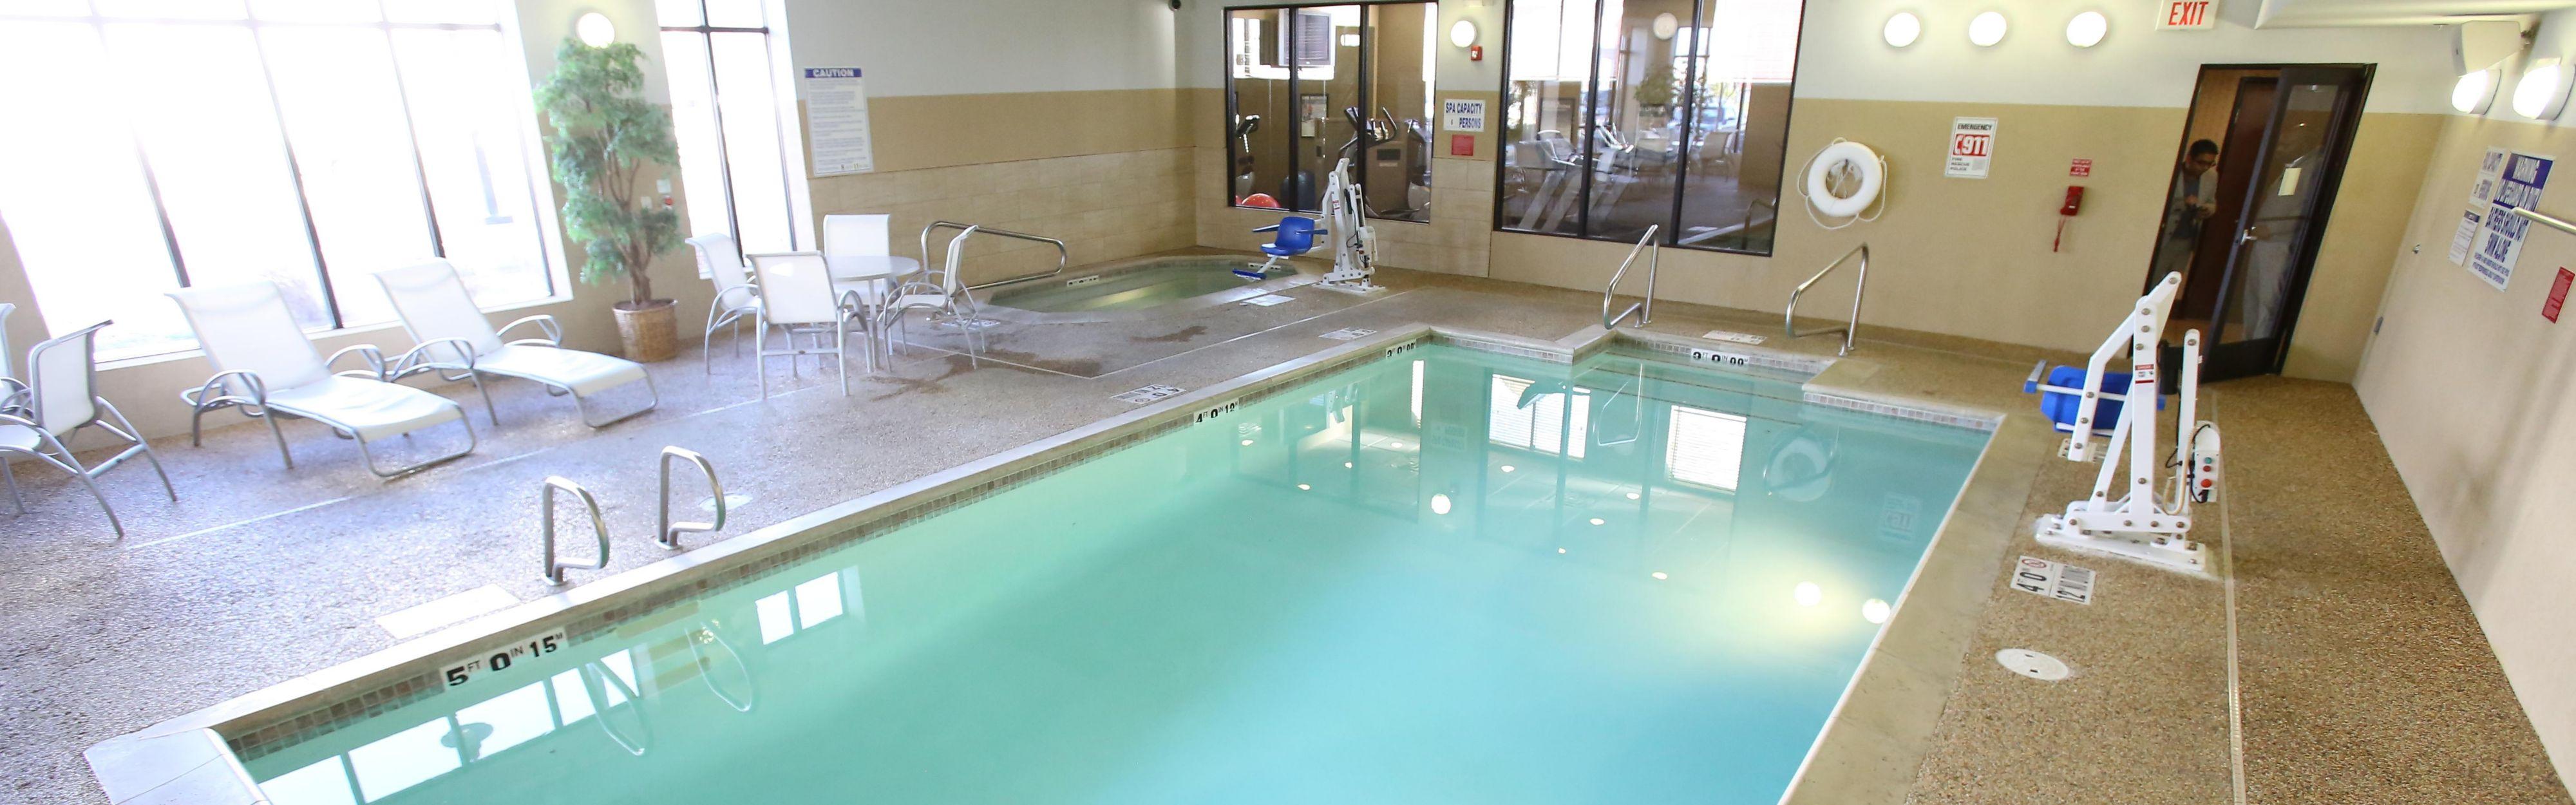 Hilton Hotels Near Ski Resorts